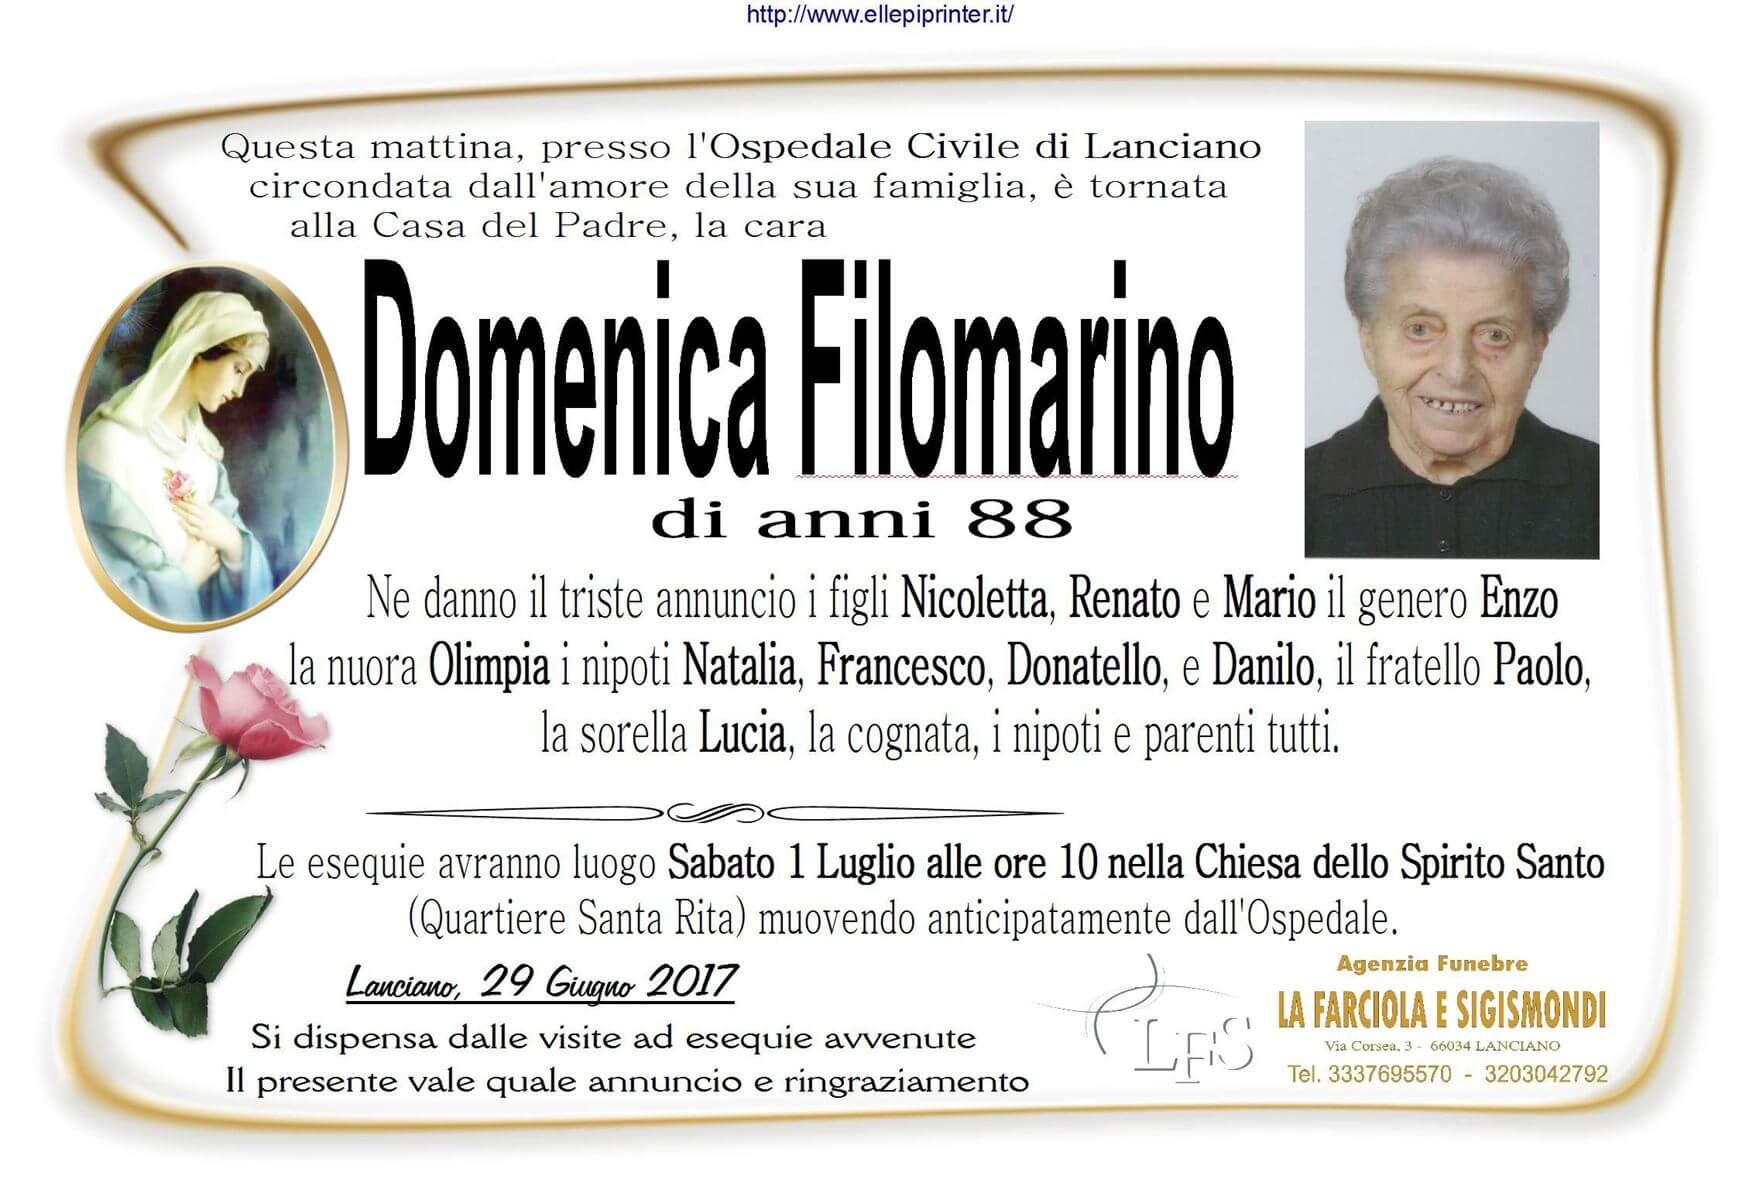 Necrologio La Farciola e Sigismondi Lanciano - Filomarino Domenica